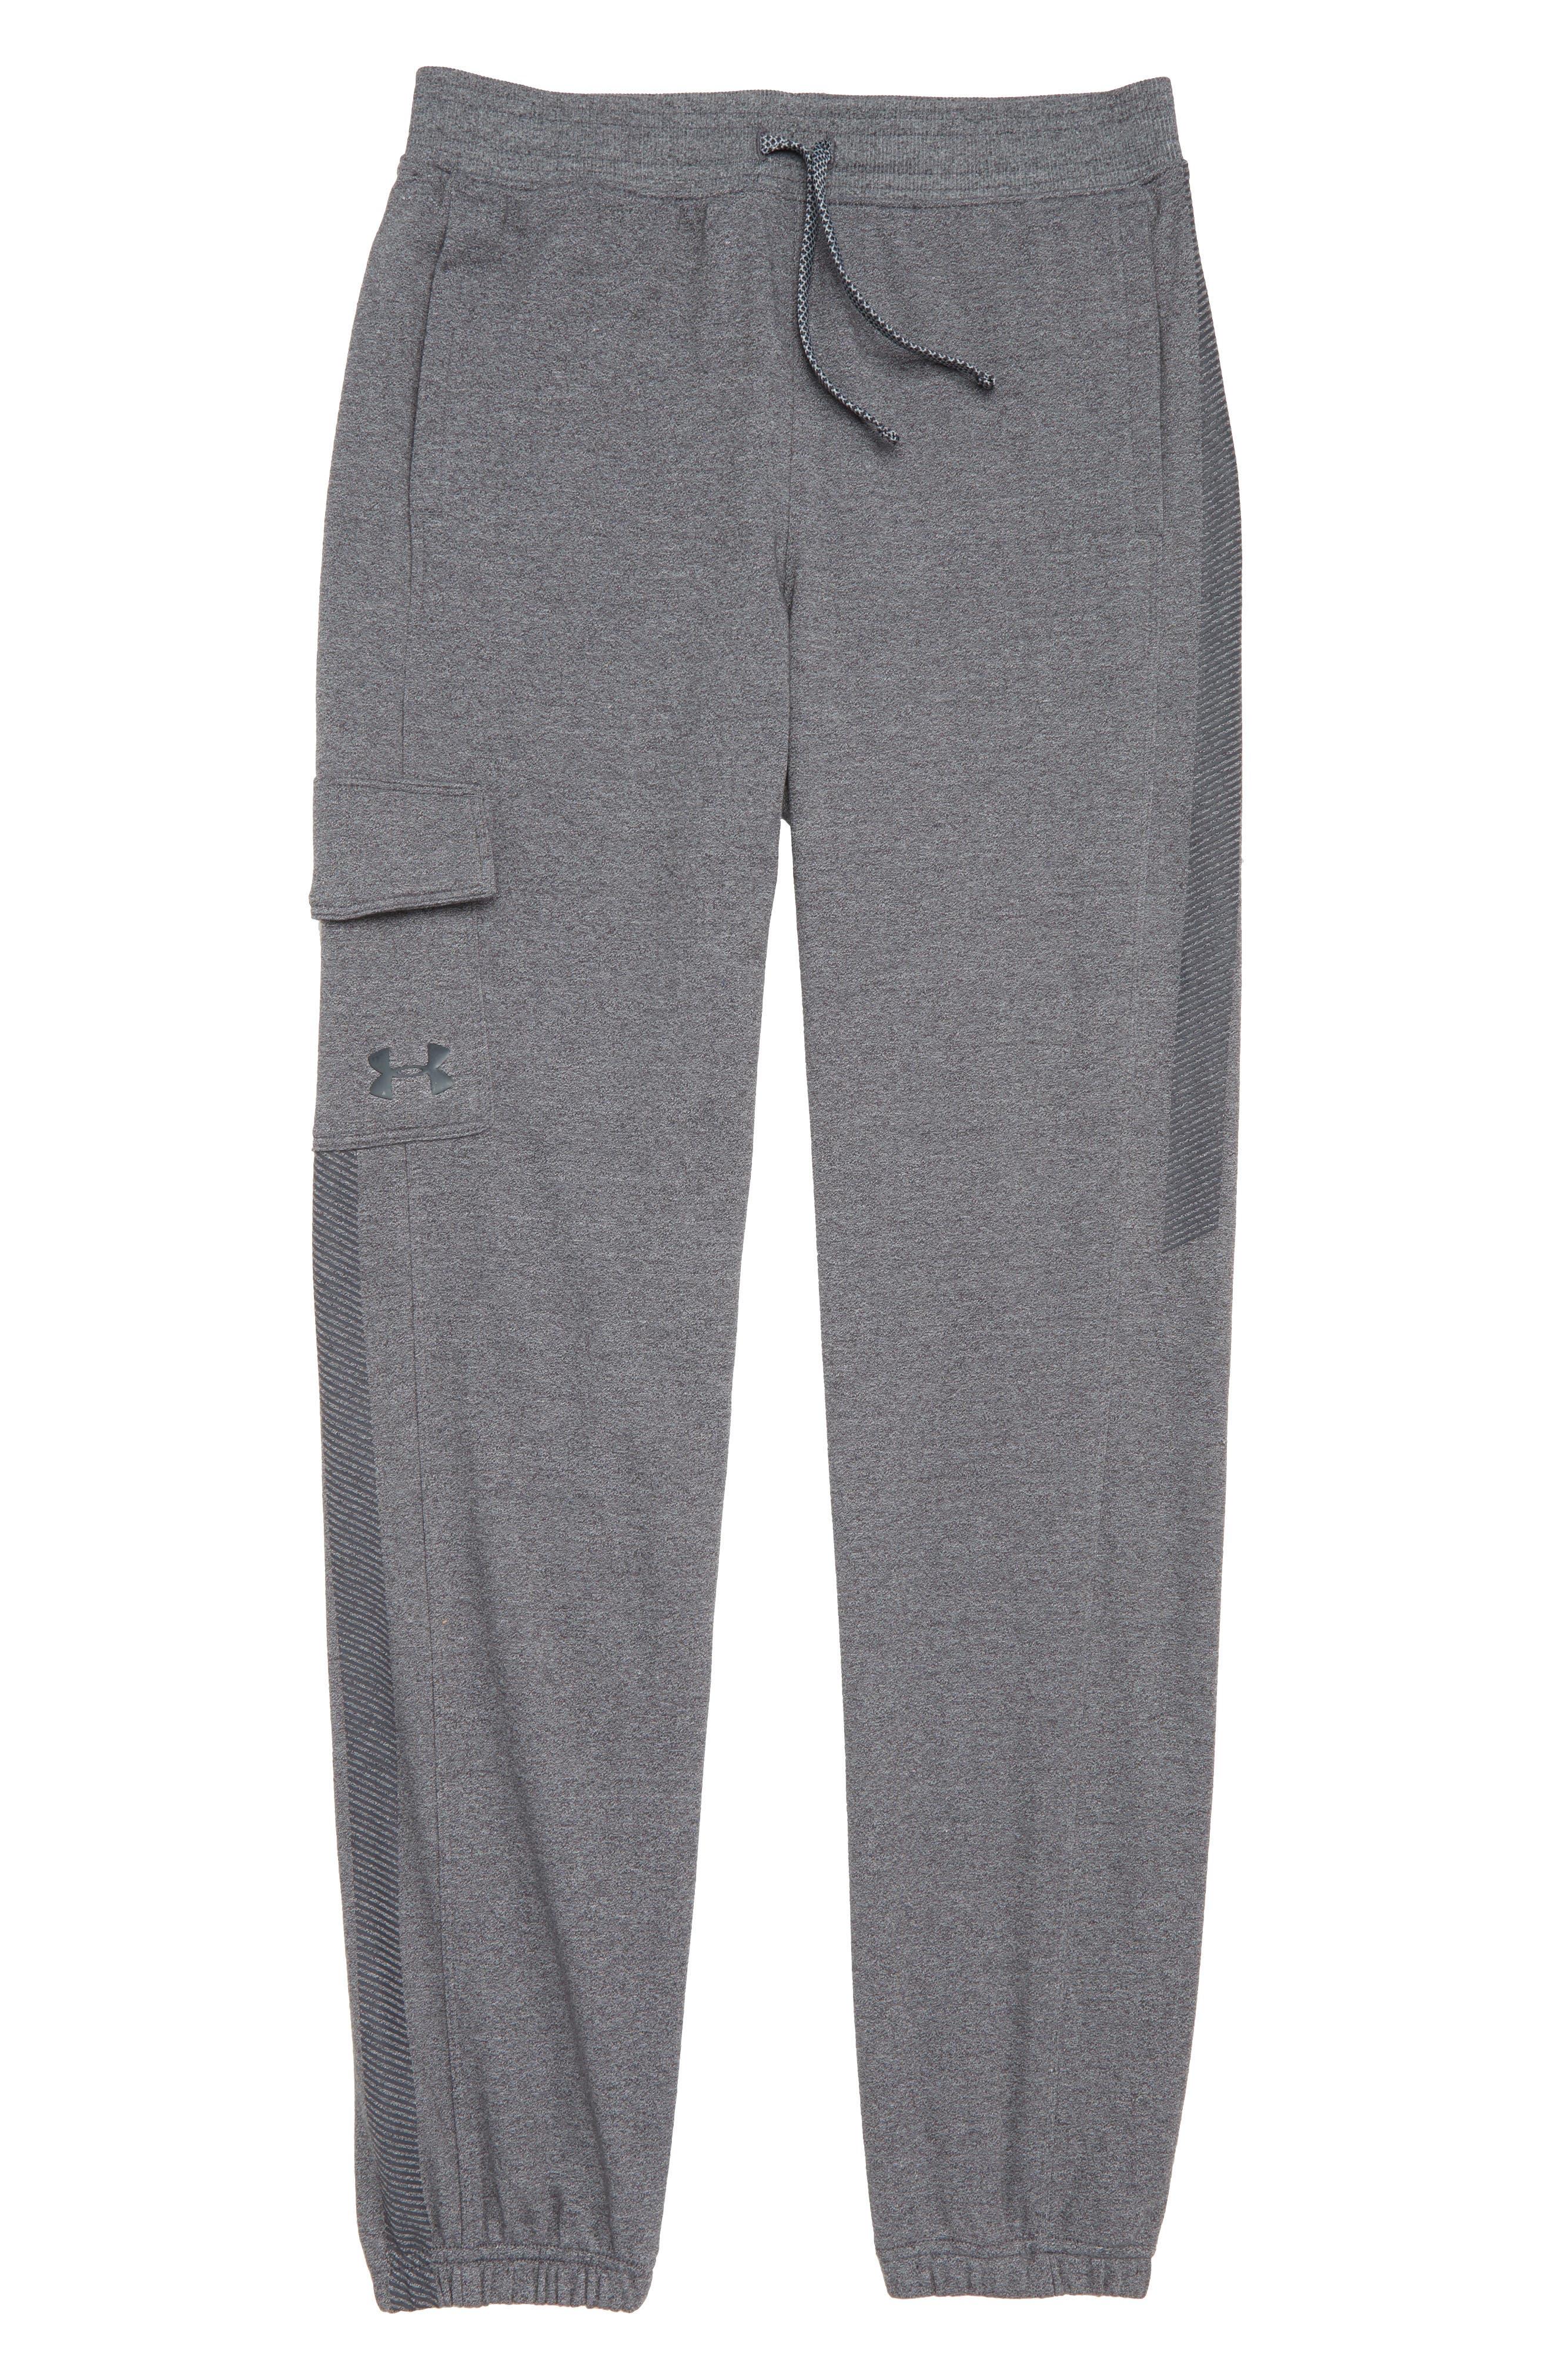 Threadborne Jogger Pants,                         Main,                         color, Stealth Gray Light Heather